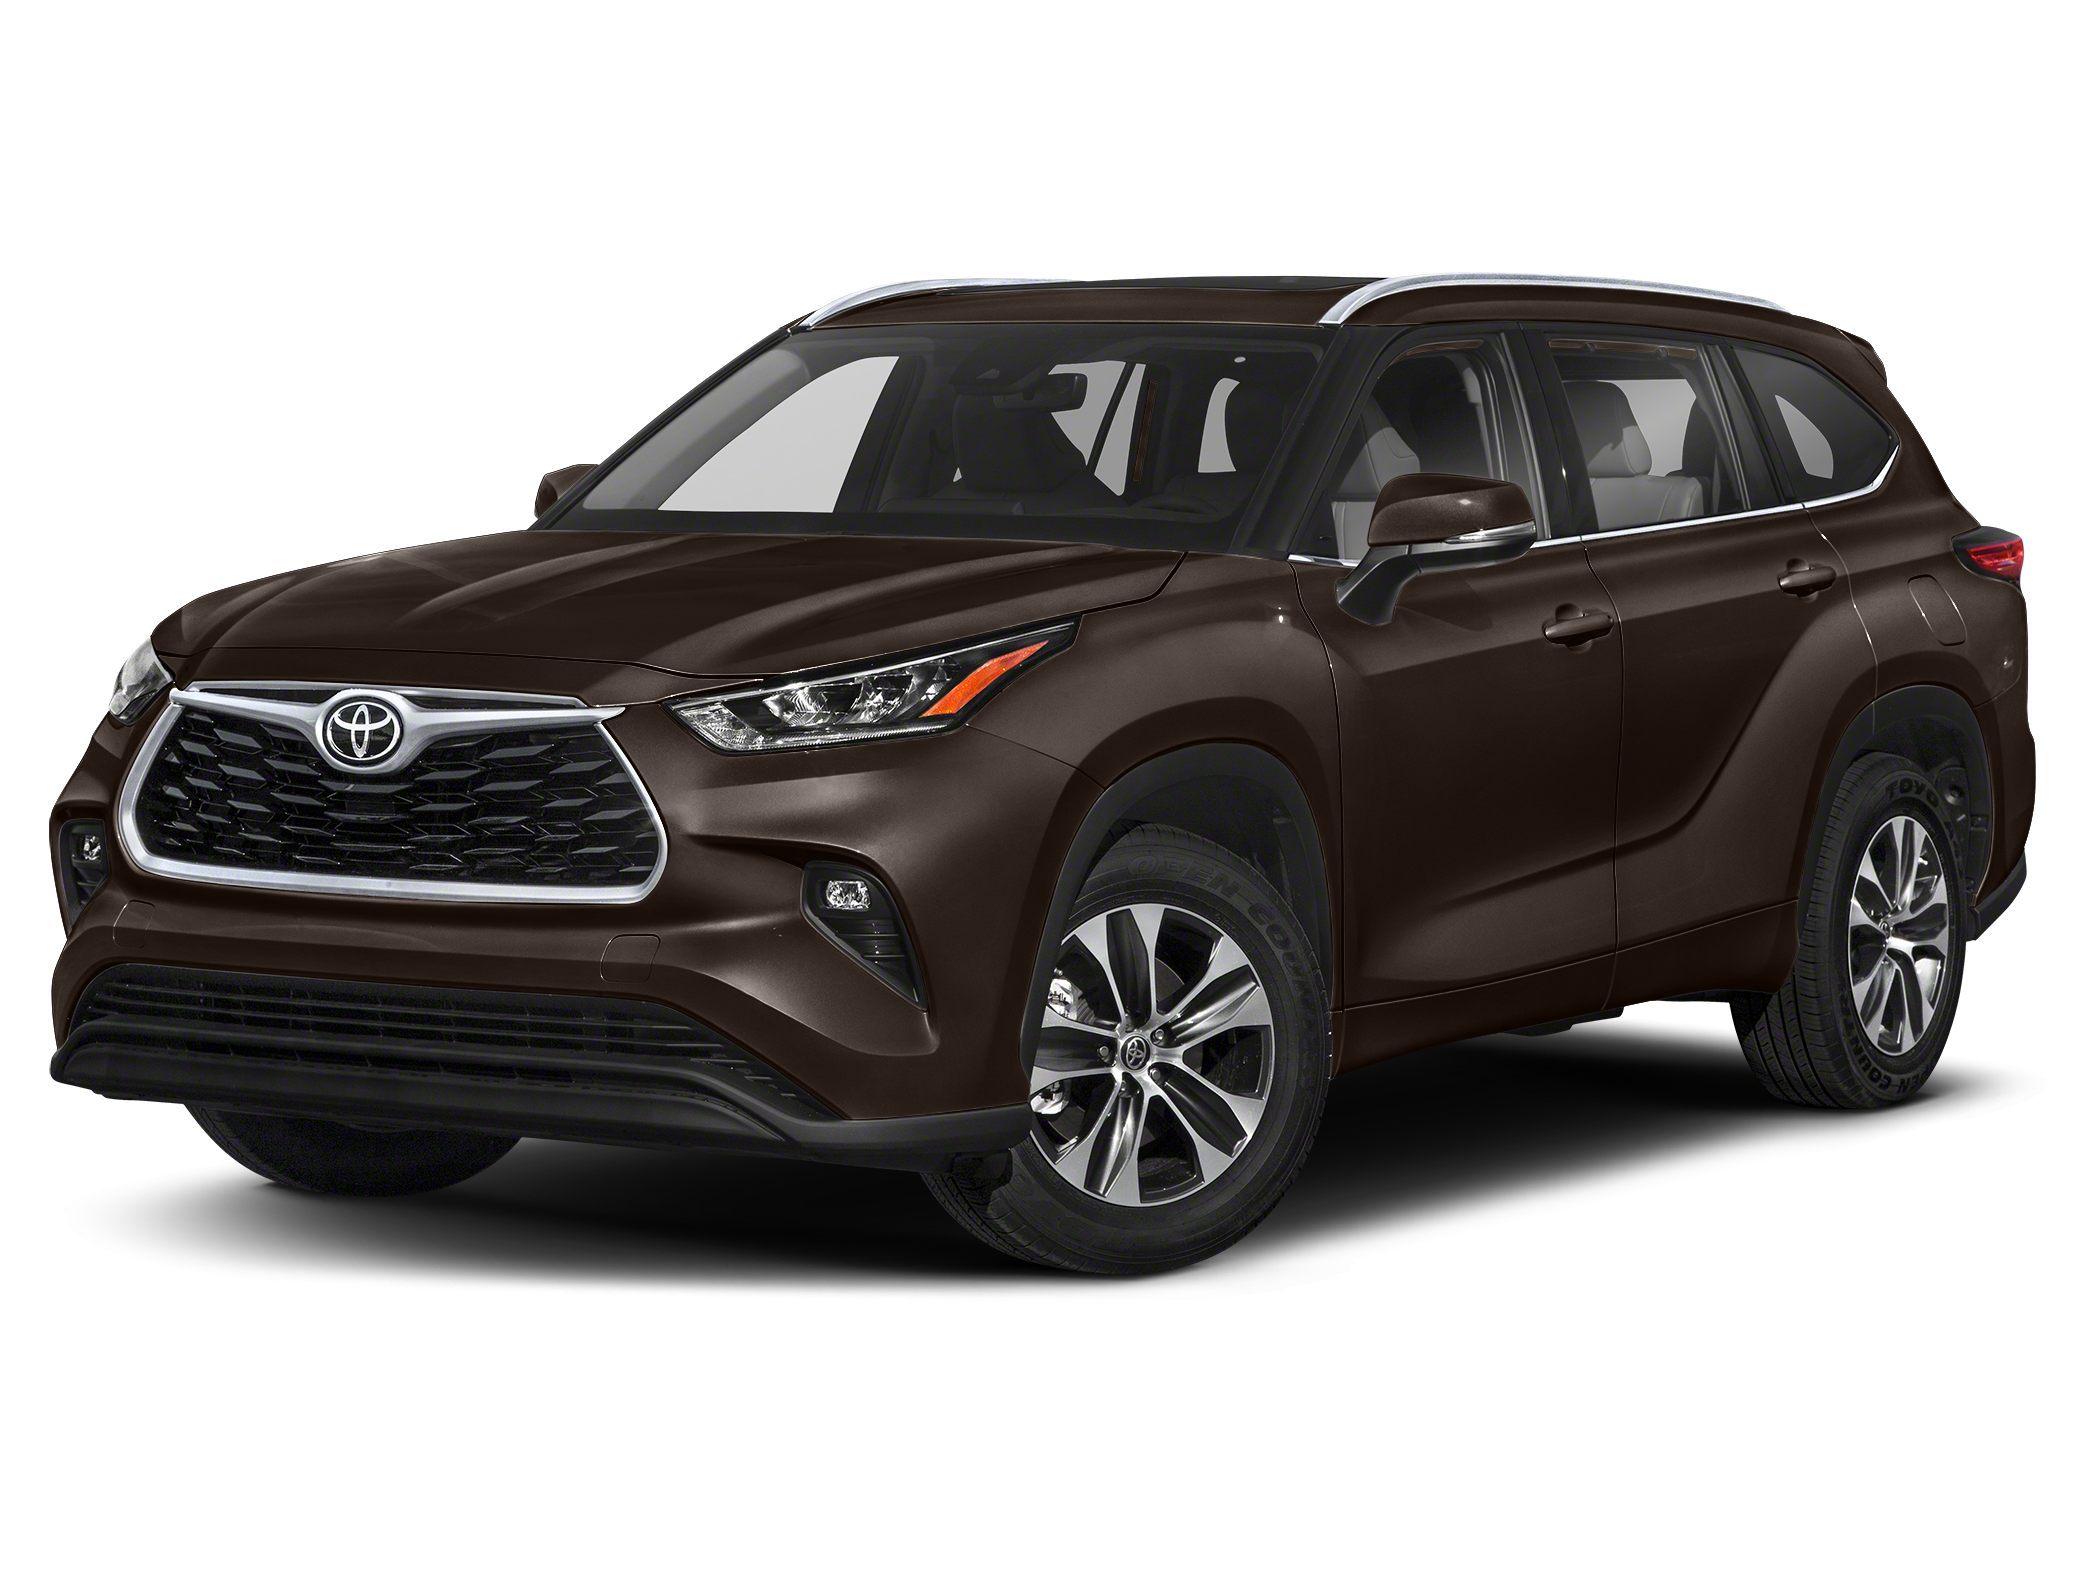 2021 Toyota Highlander SUV